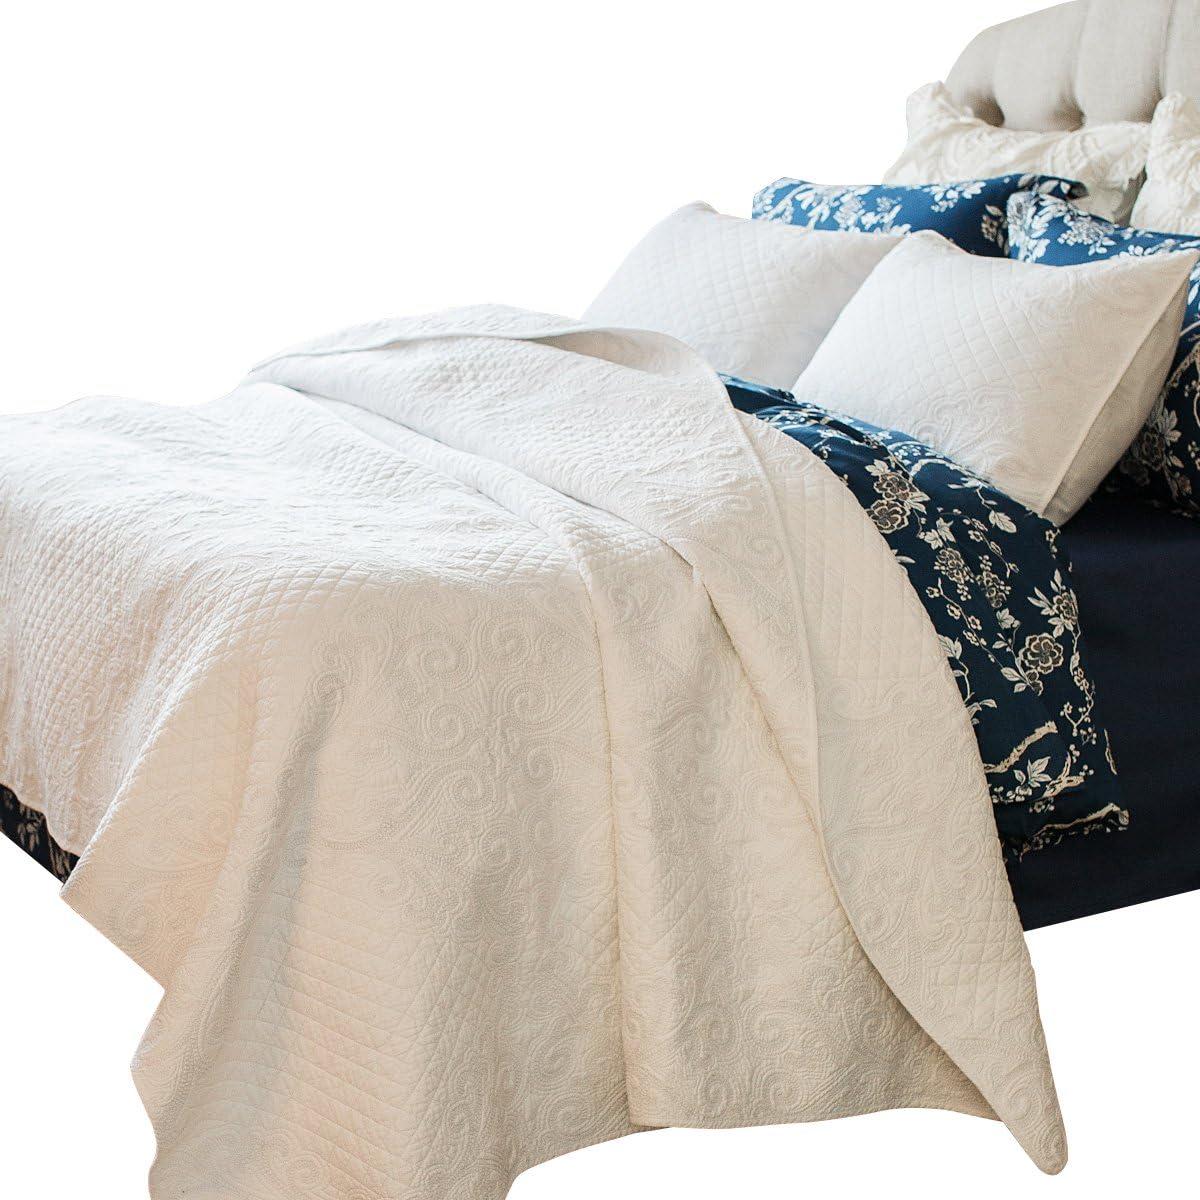 Brandream White Shabby Vintage Bedding Set Queen Size Bed Quilt Set 100% Cotton Coverlet Set